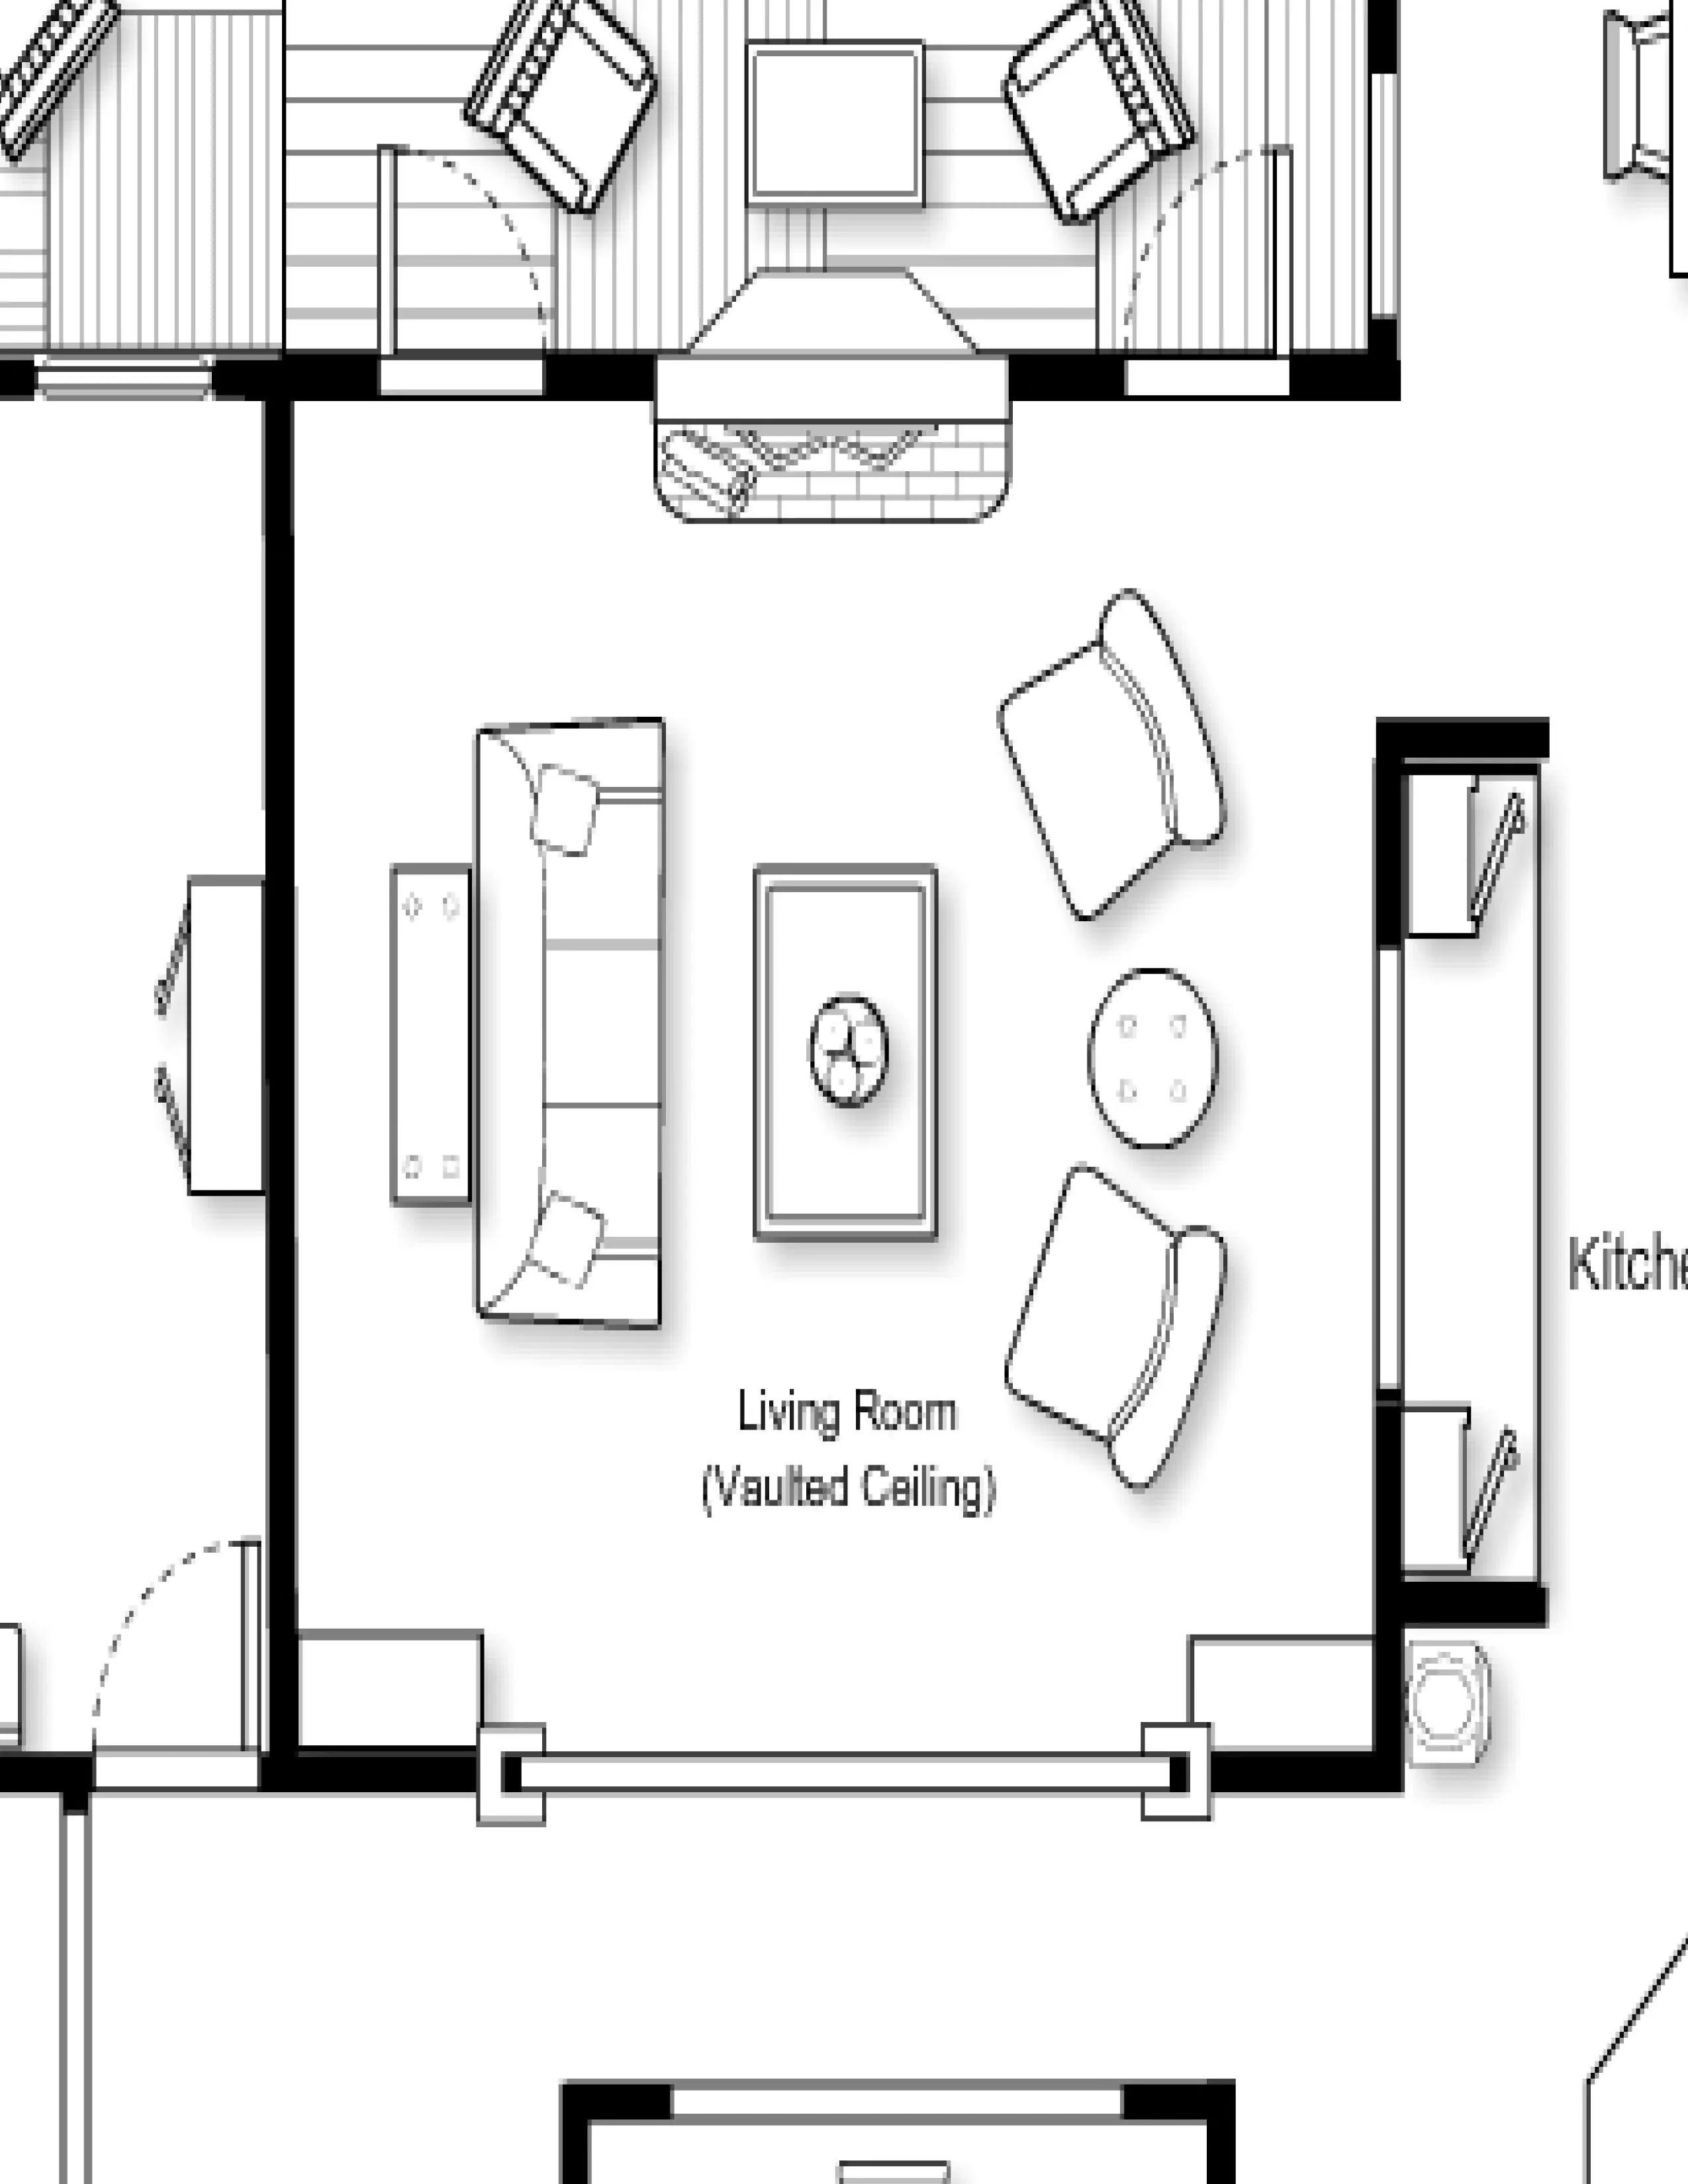 Mar Wiring Diagram For Steven Auto Electrical Ktm Schemes